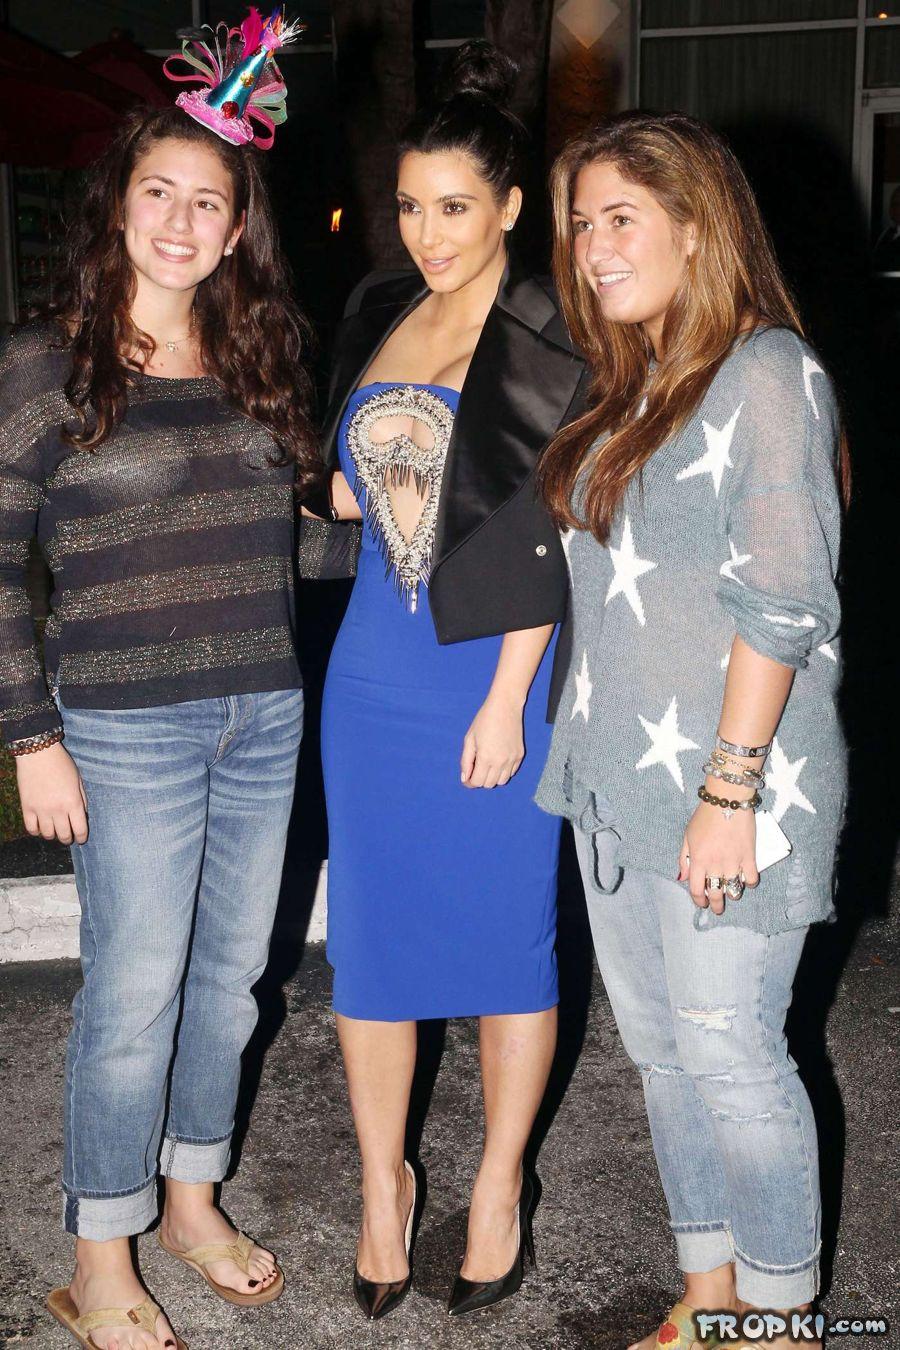 Pregnant Kim Kardashian steps out for dinner AdqW0x4m